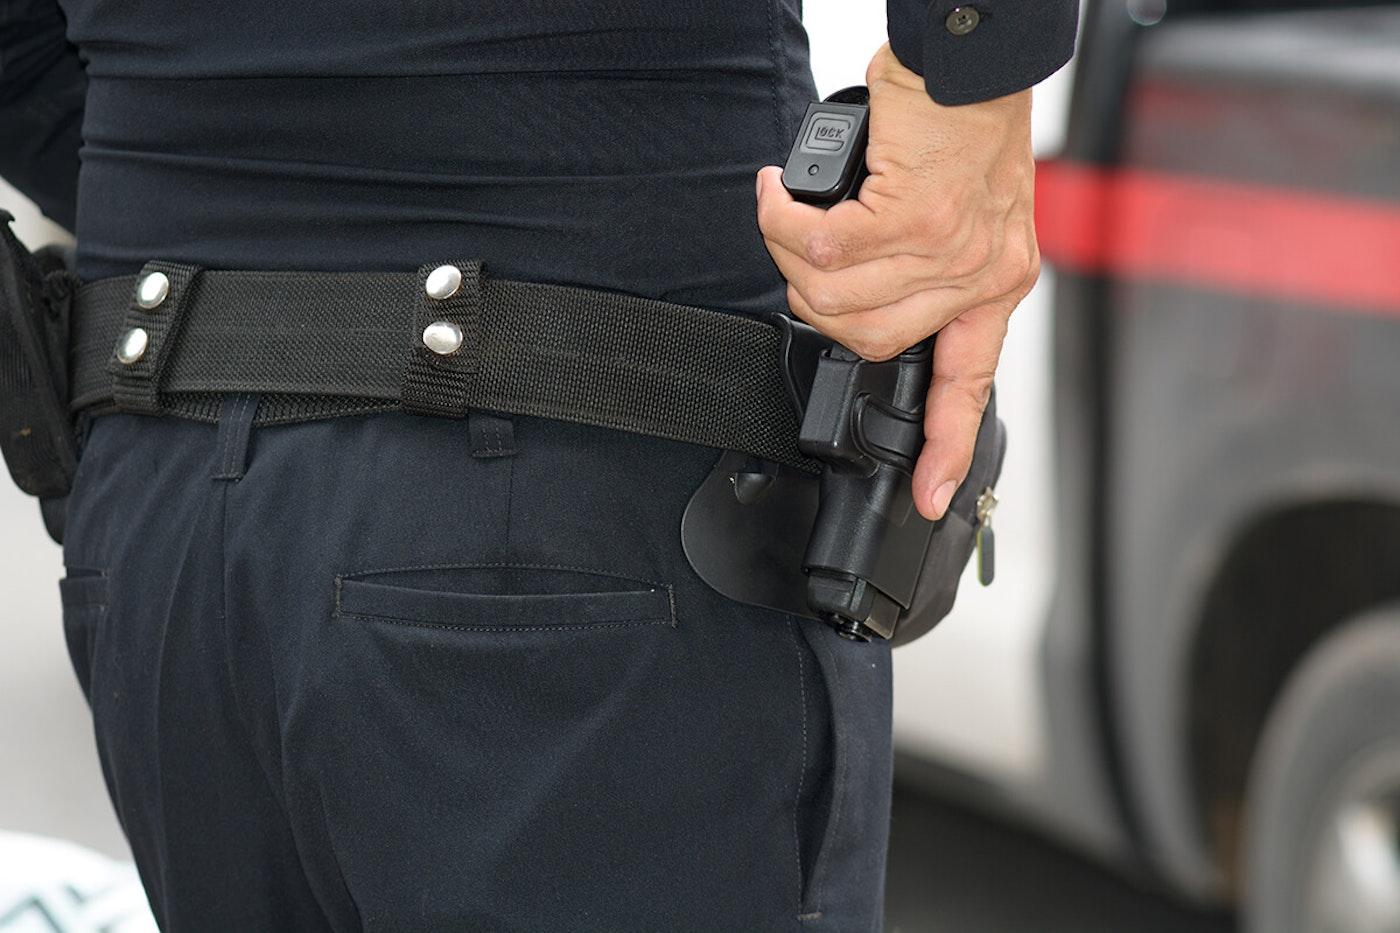 A police officer draws a gun